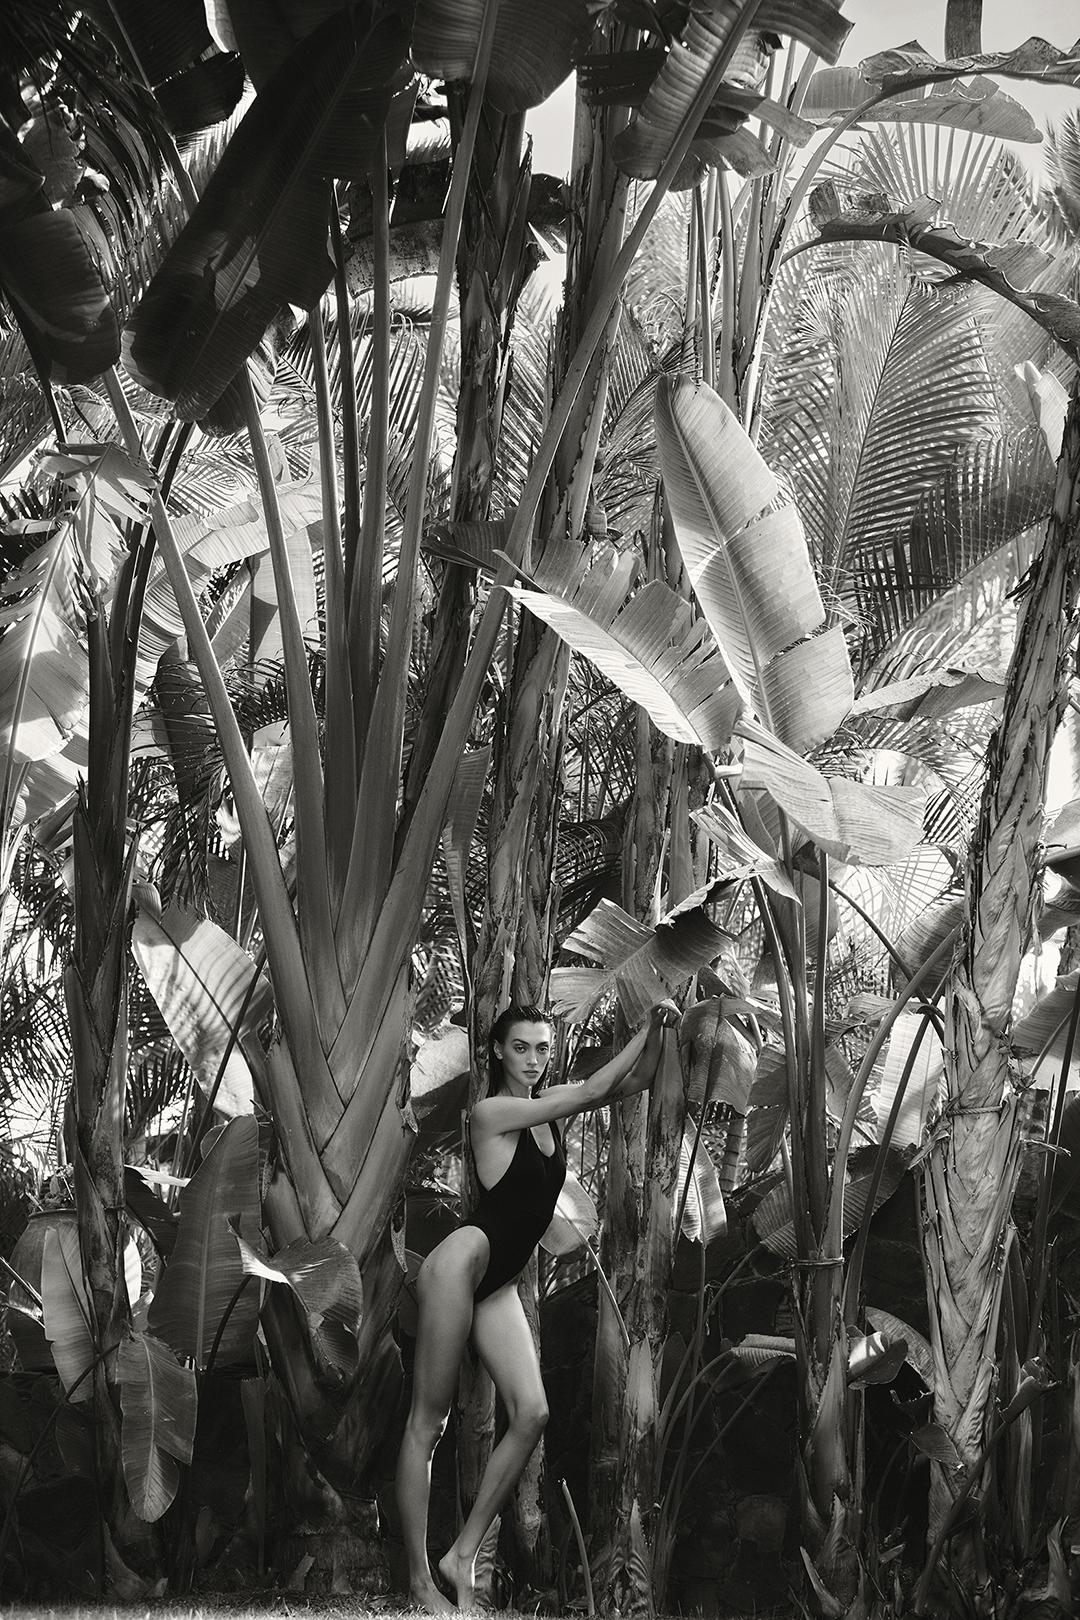 Neus Bermejo - InStyle - InStyle Spain - Editorial - Francesca Rinciari - 8AM - 8 Artist Management